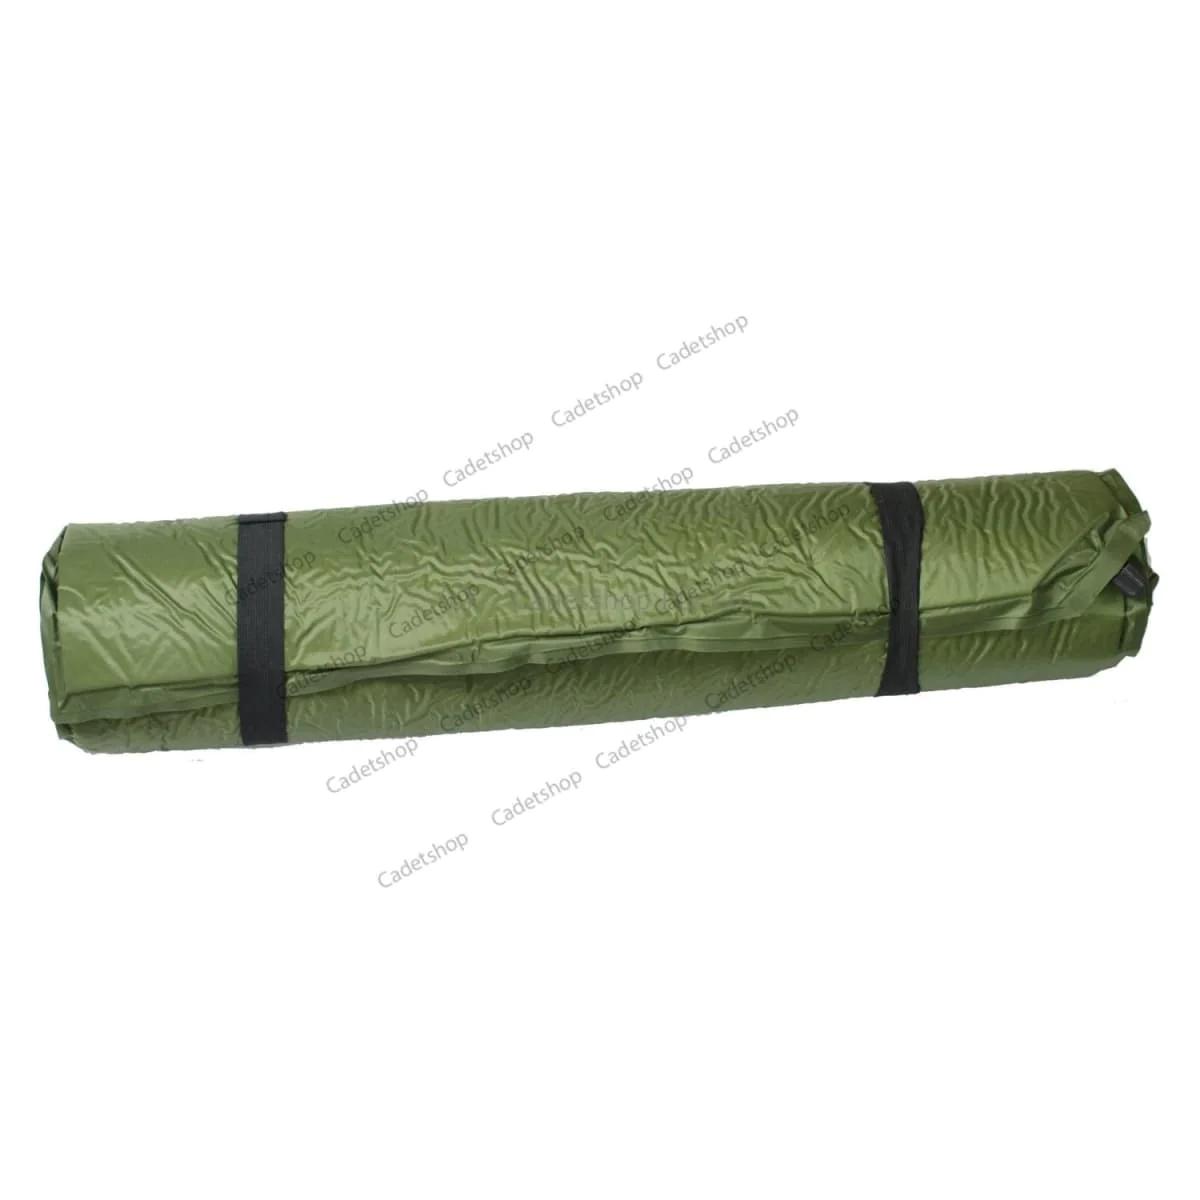 Original NIP 2011 Dated Therm-A-Rest Self-Inflating Sleeping Mat